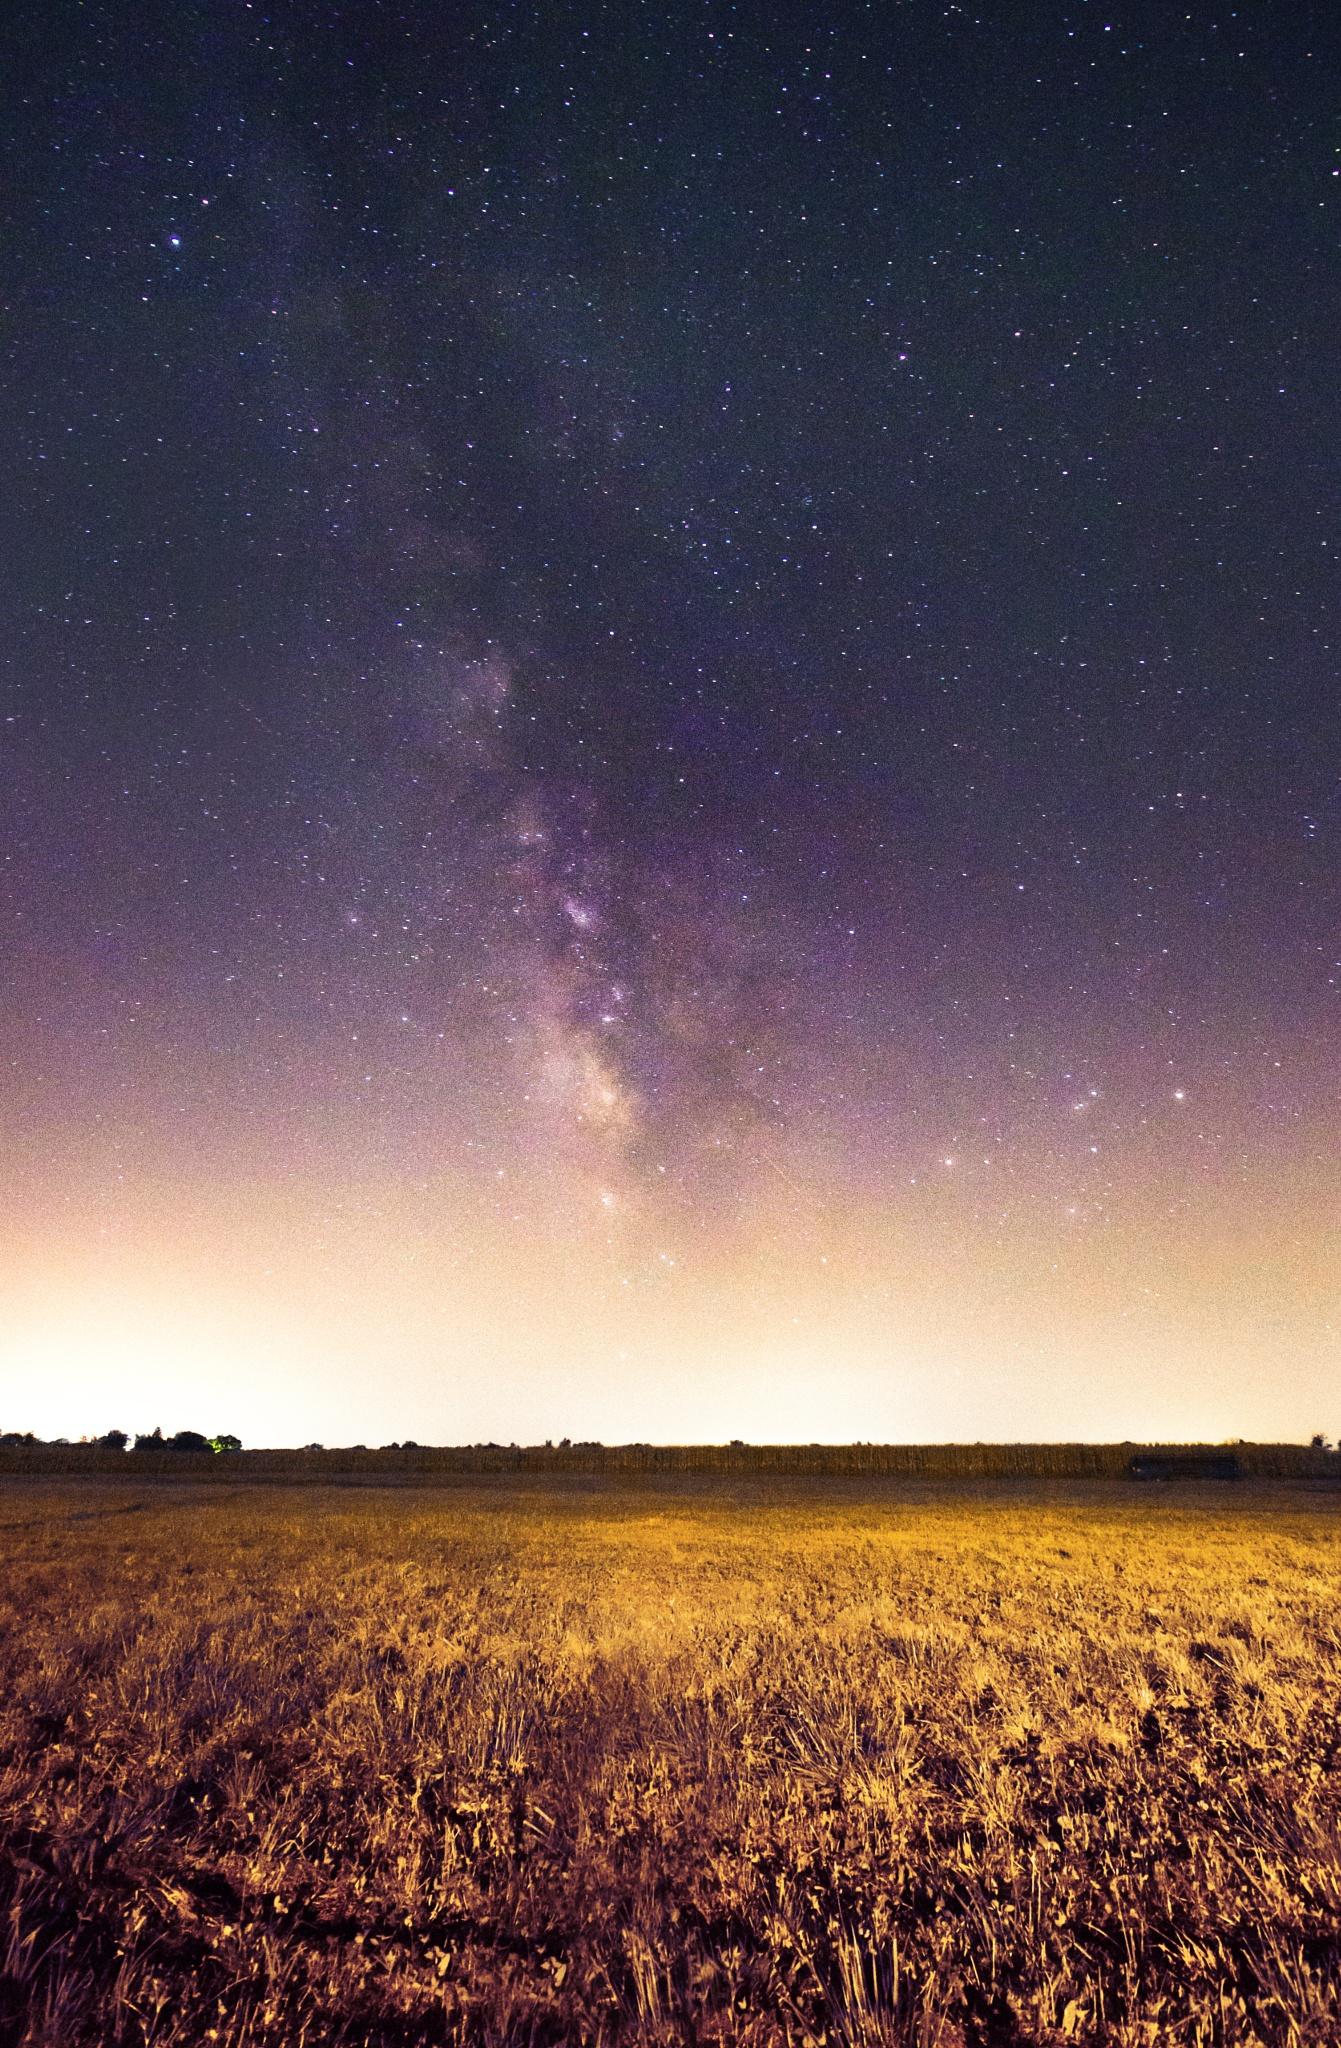 Horizon by Ultravphotography